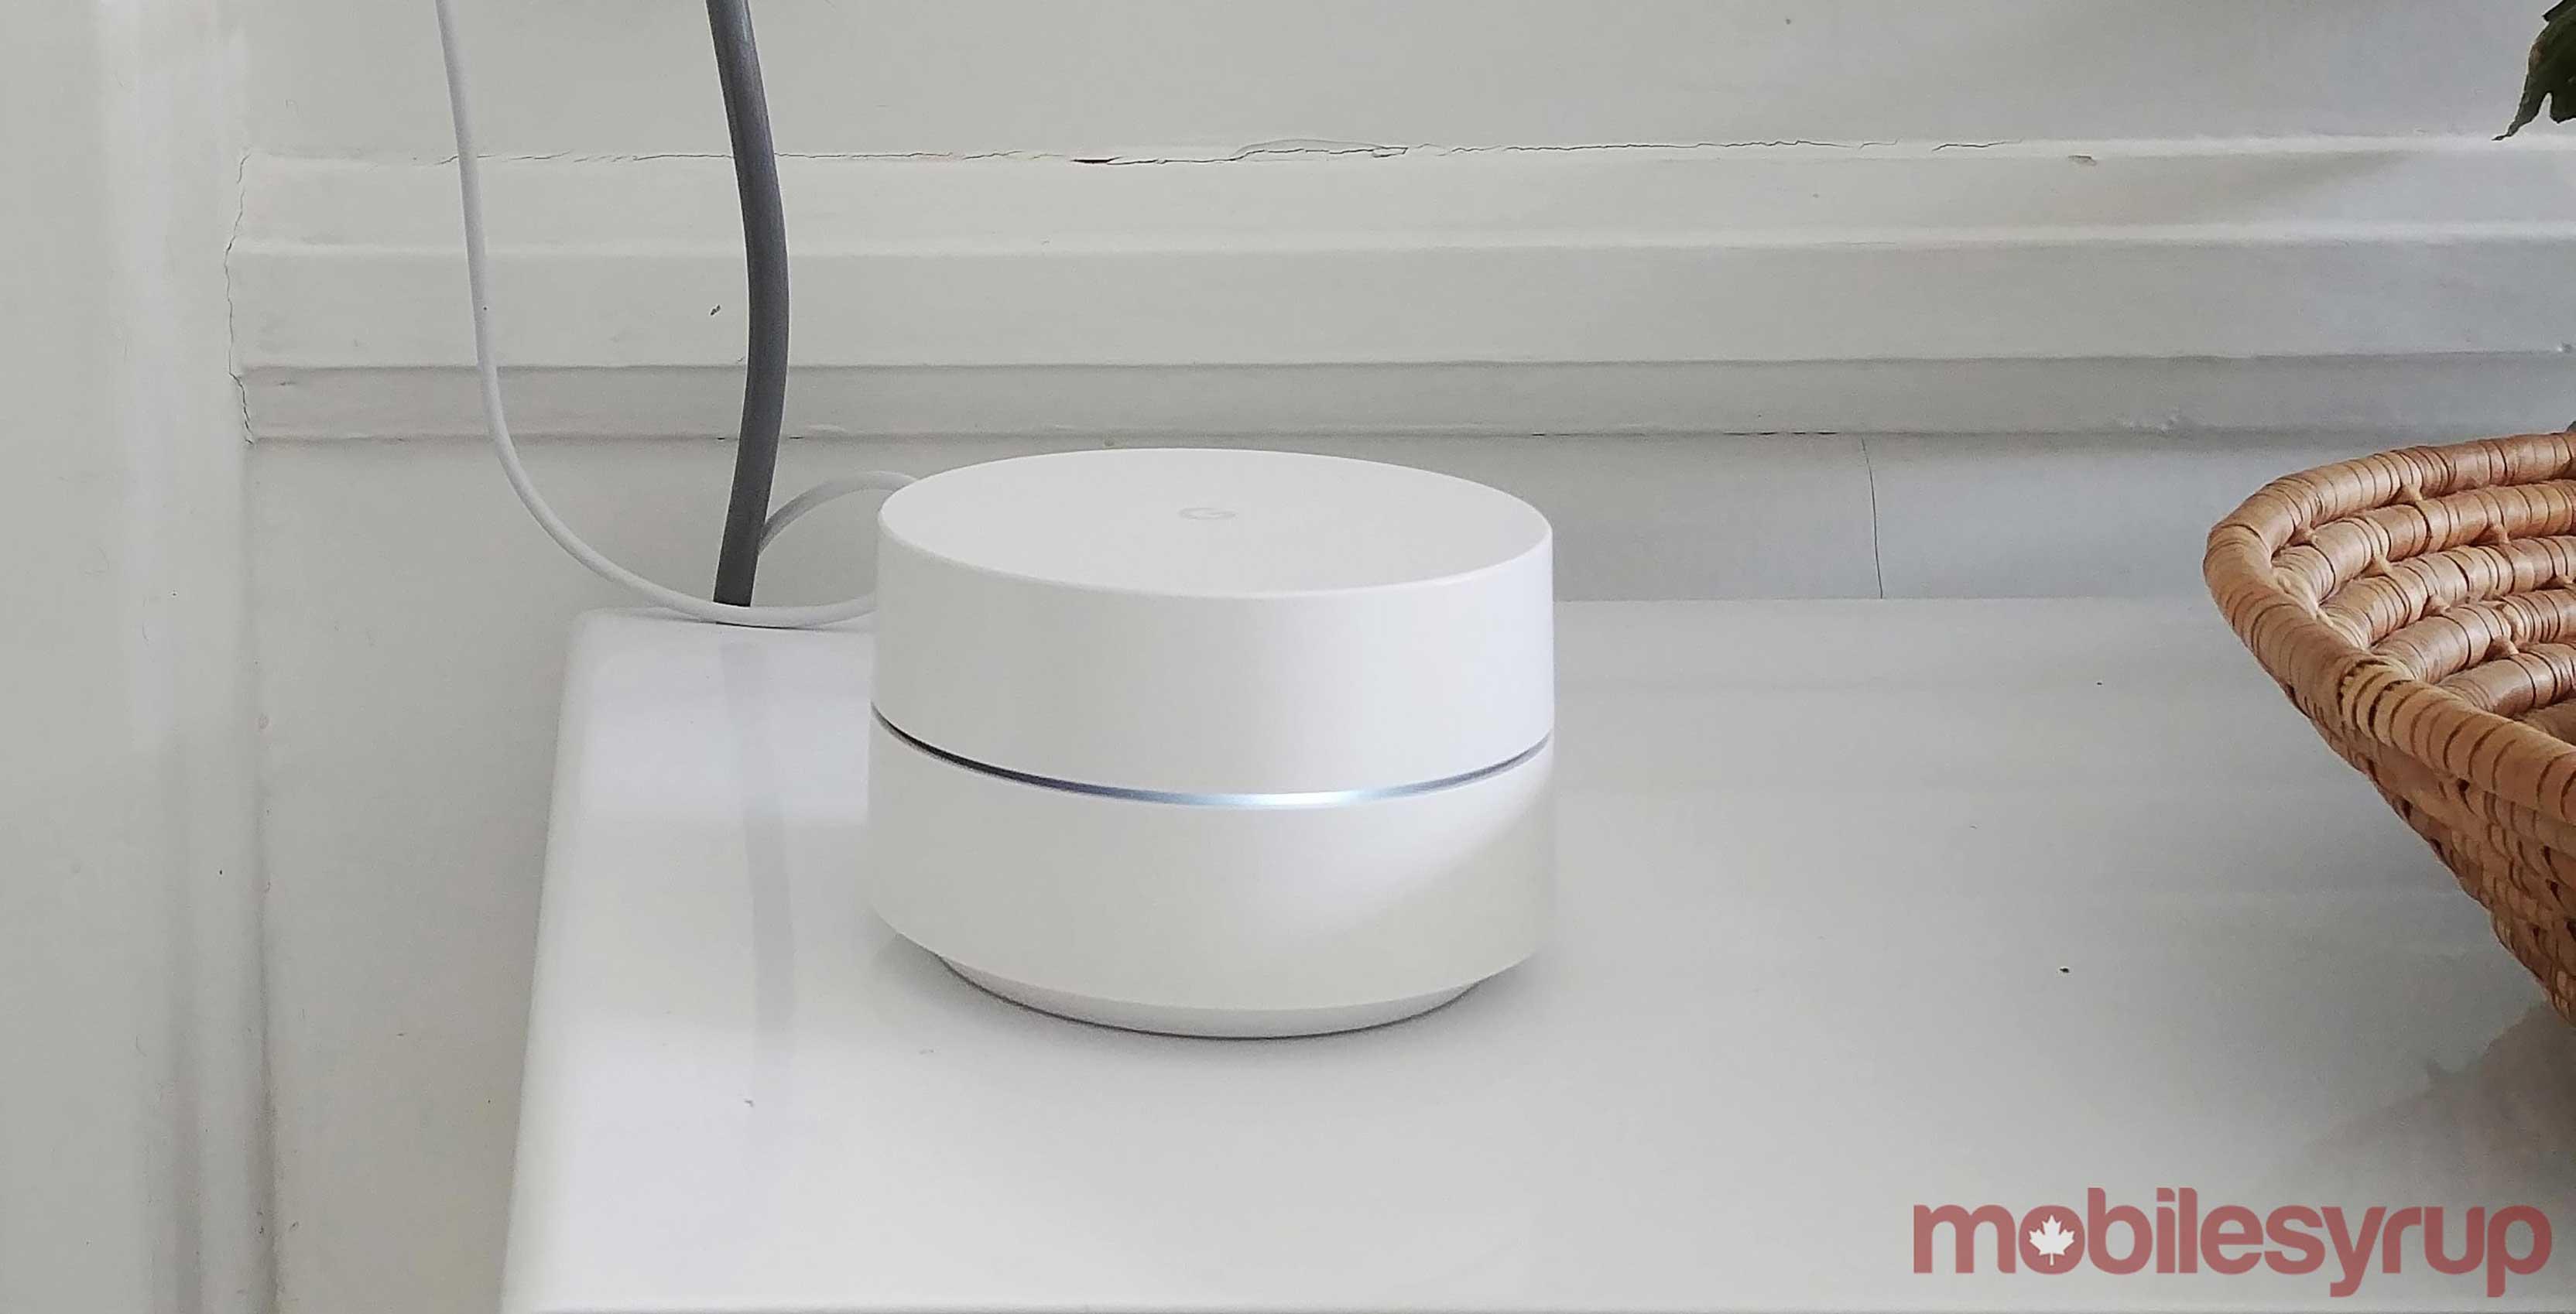 Google Wifi in kitchen